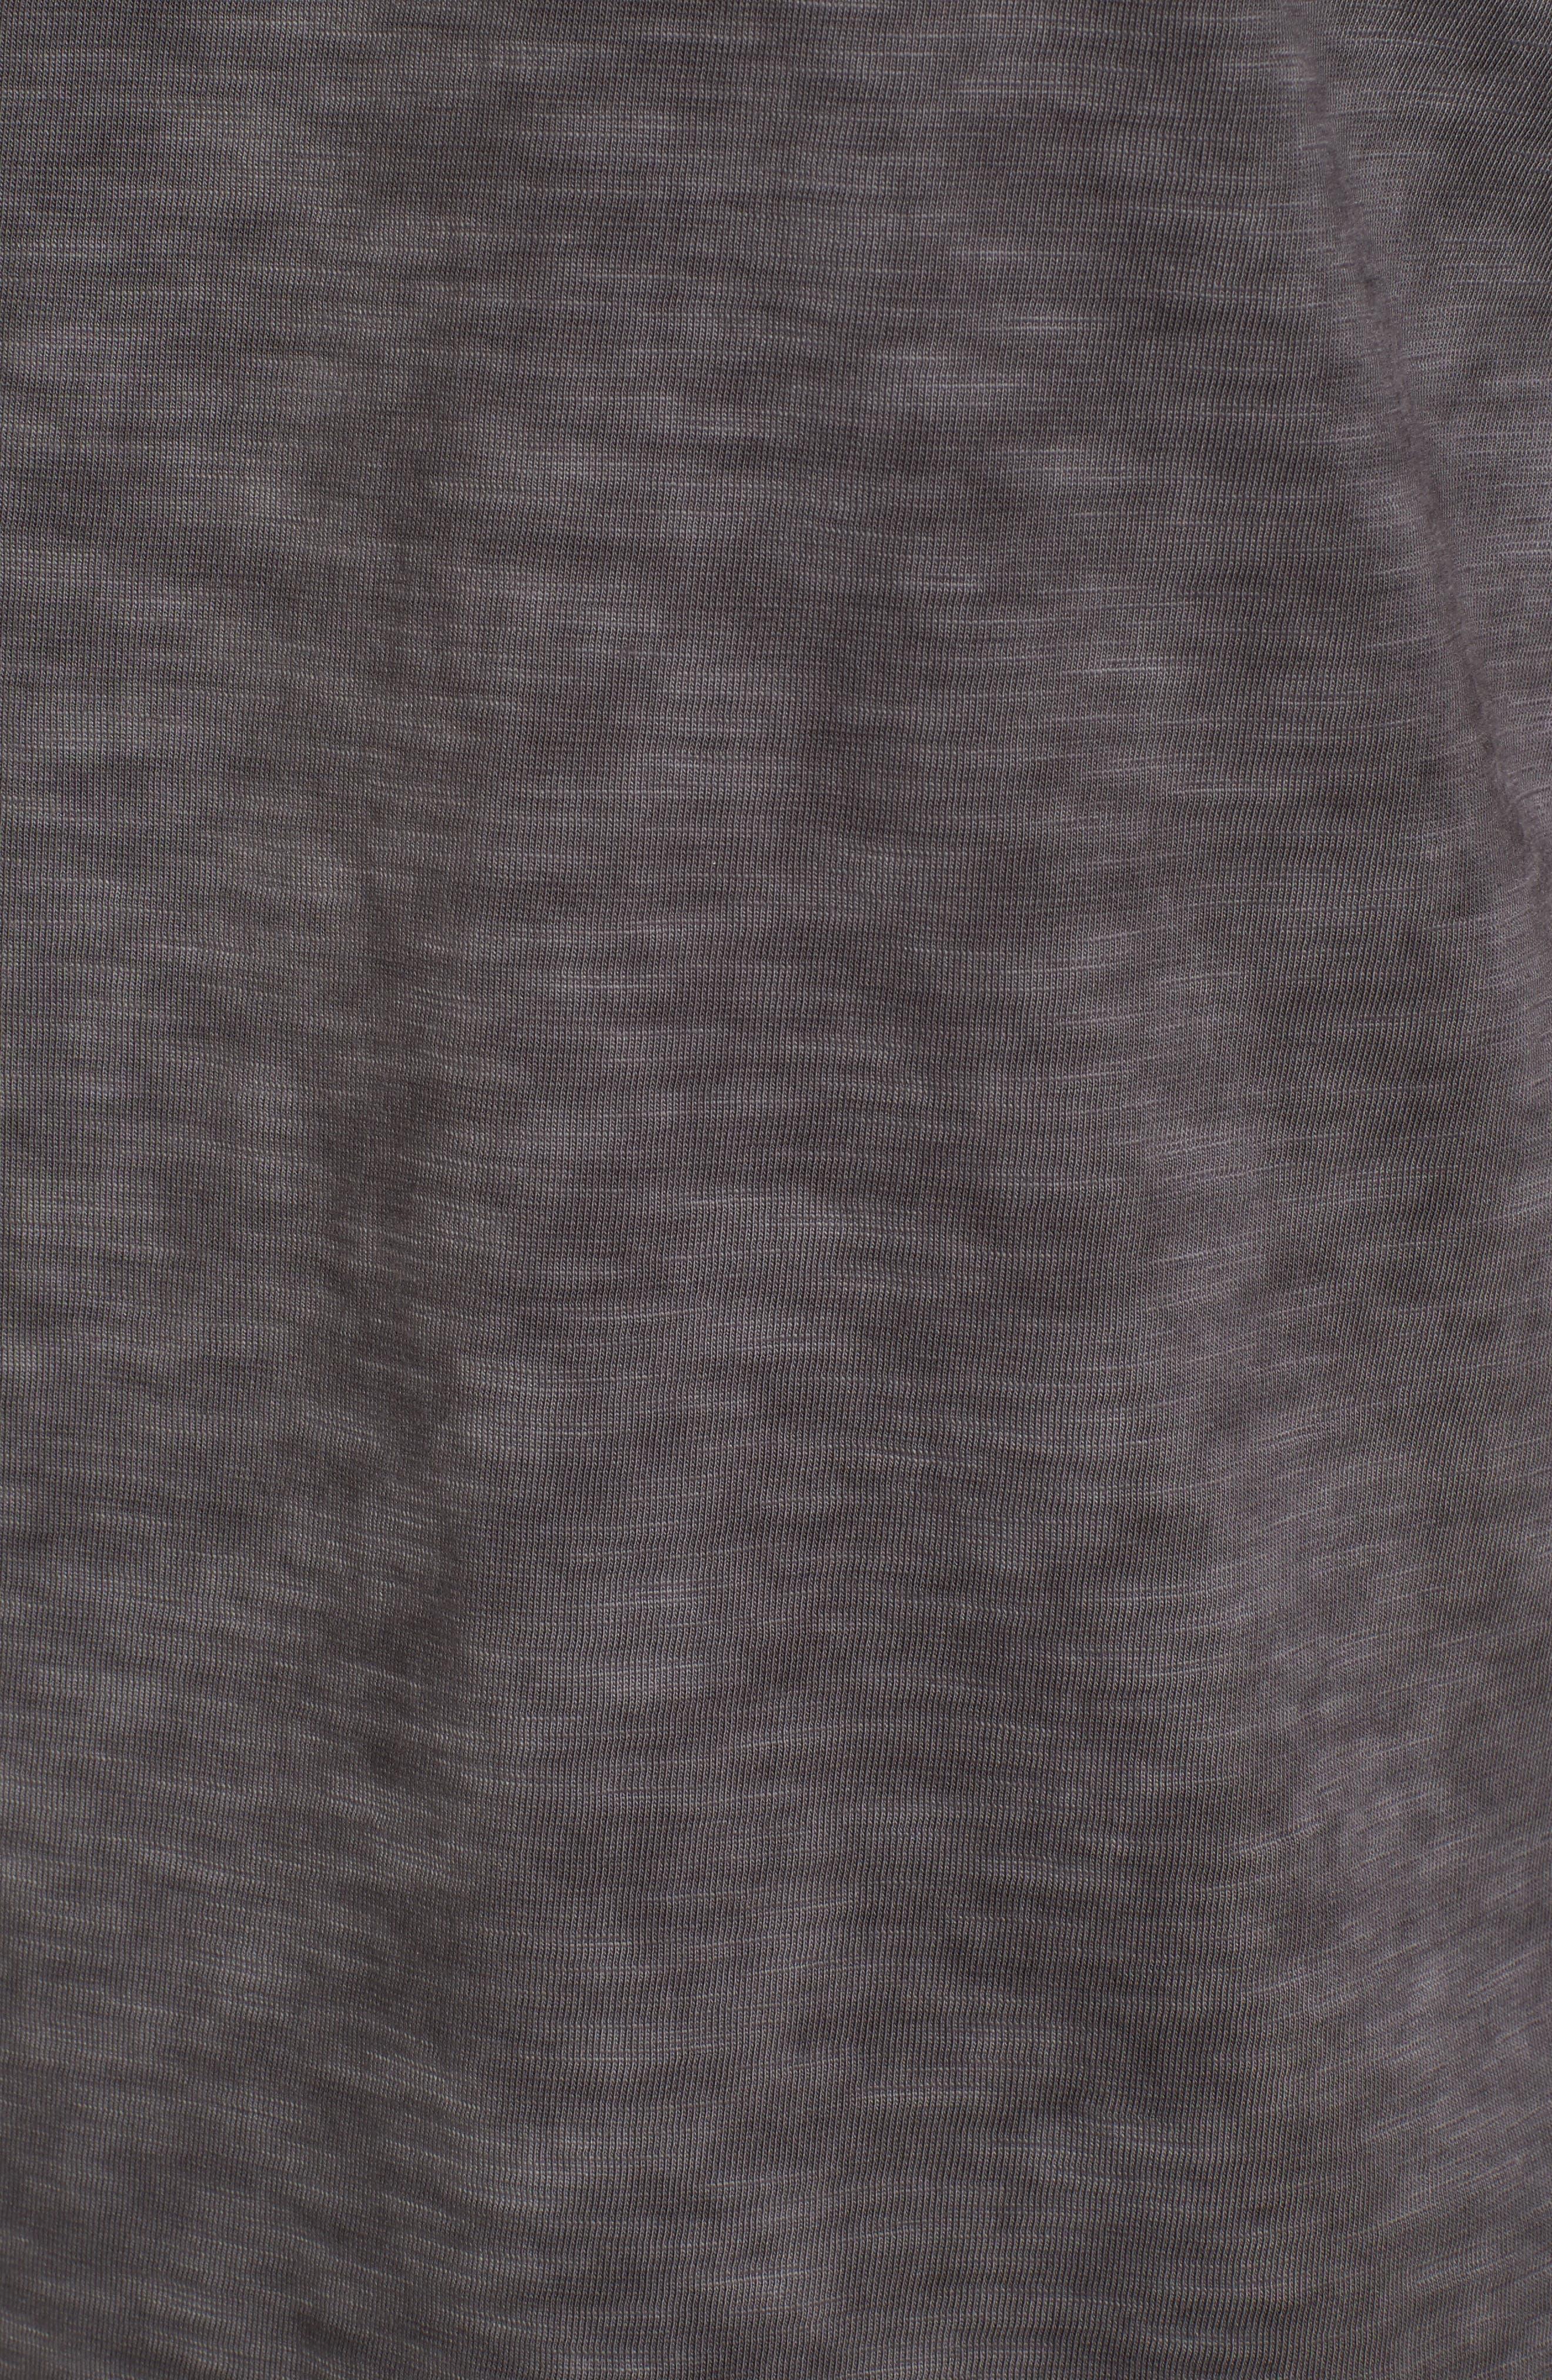 Suncoast Shores V-Neck T-Shirt,                             Alternate thumbnail 5, color,                             001